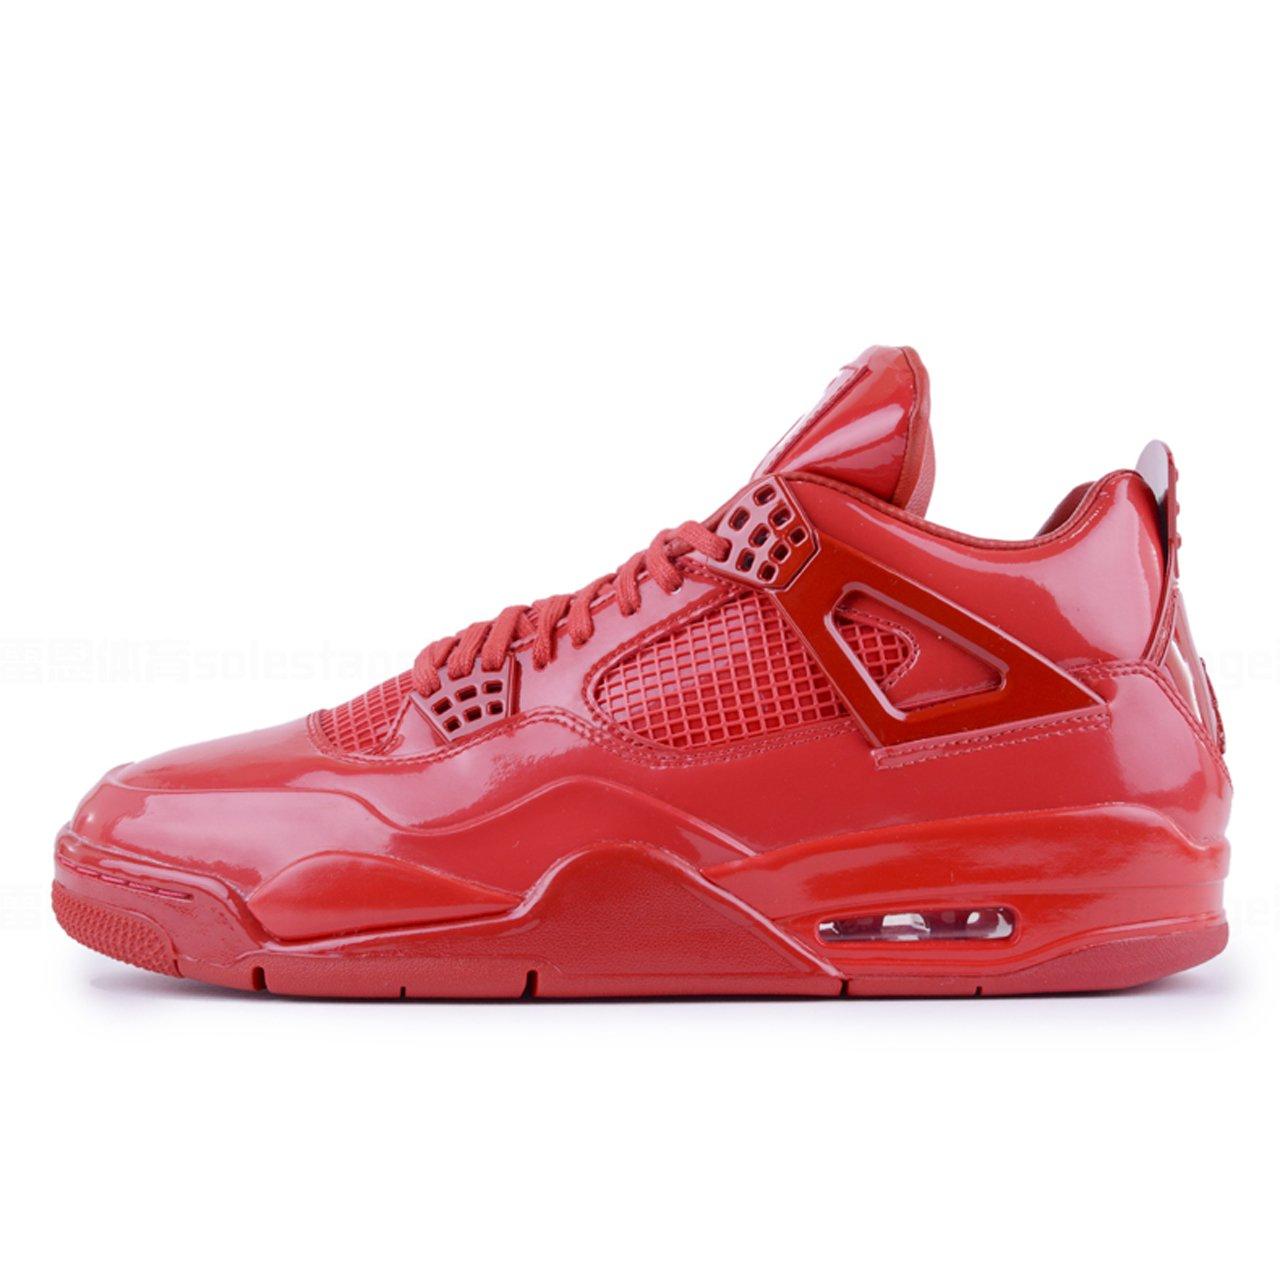 rot Nike Jordan 11lab4, Hausschuhe de Deporte Interior para Hombre